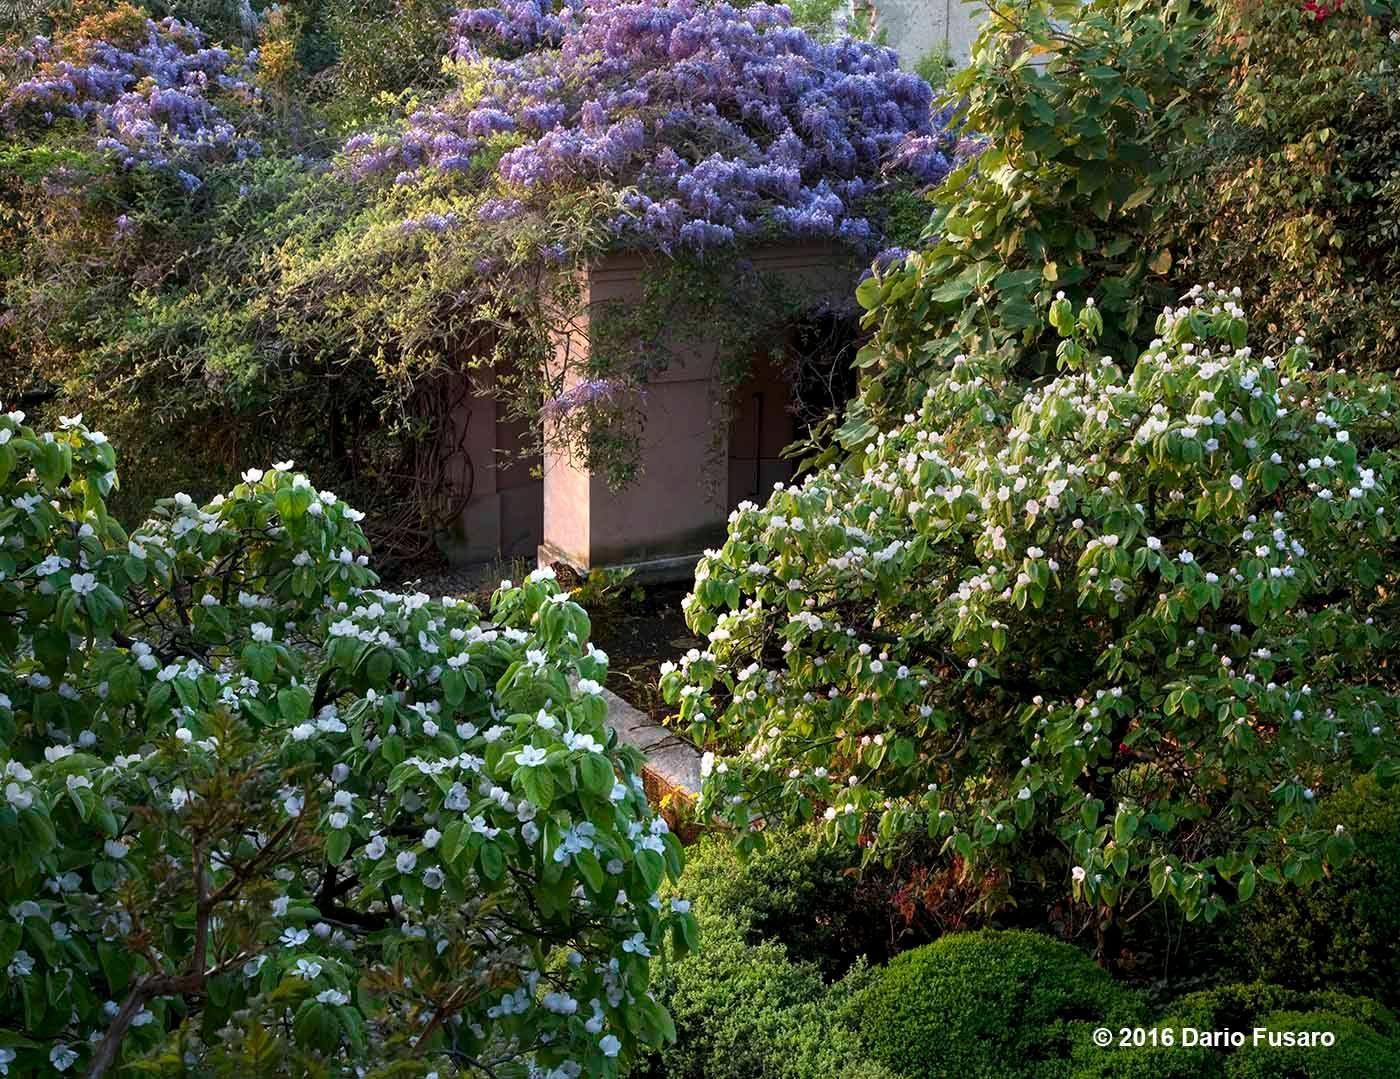 Il Bramafam, Garden Of Paolo Pejrone, Landscape Architect, Piedmont, Italy